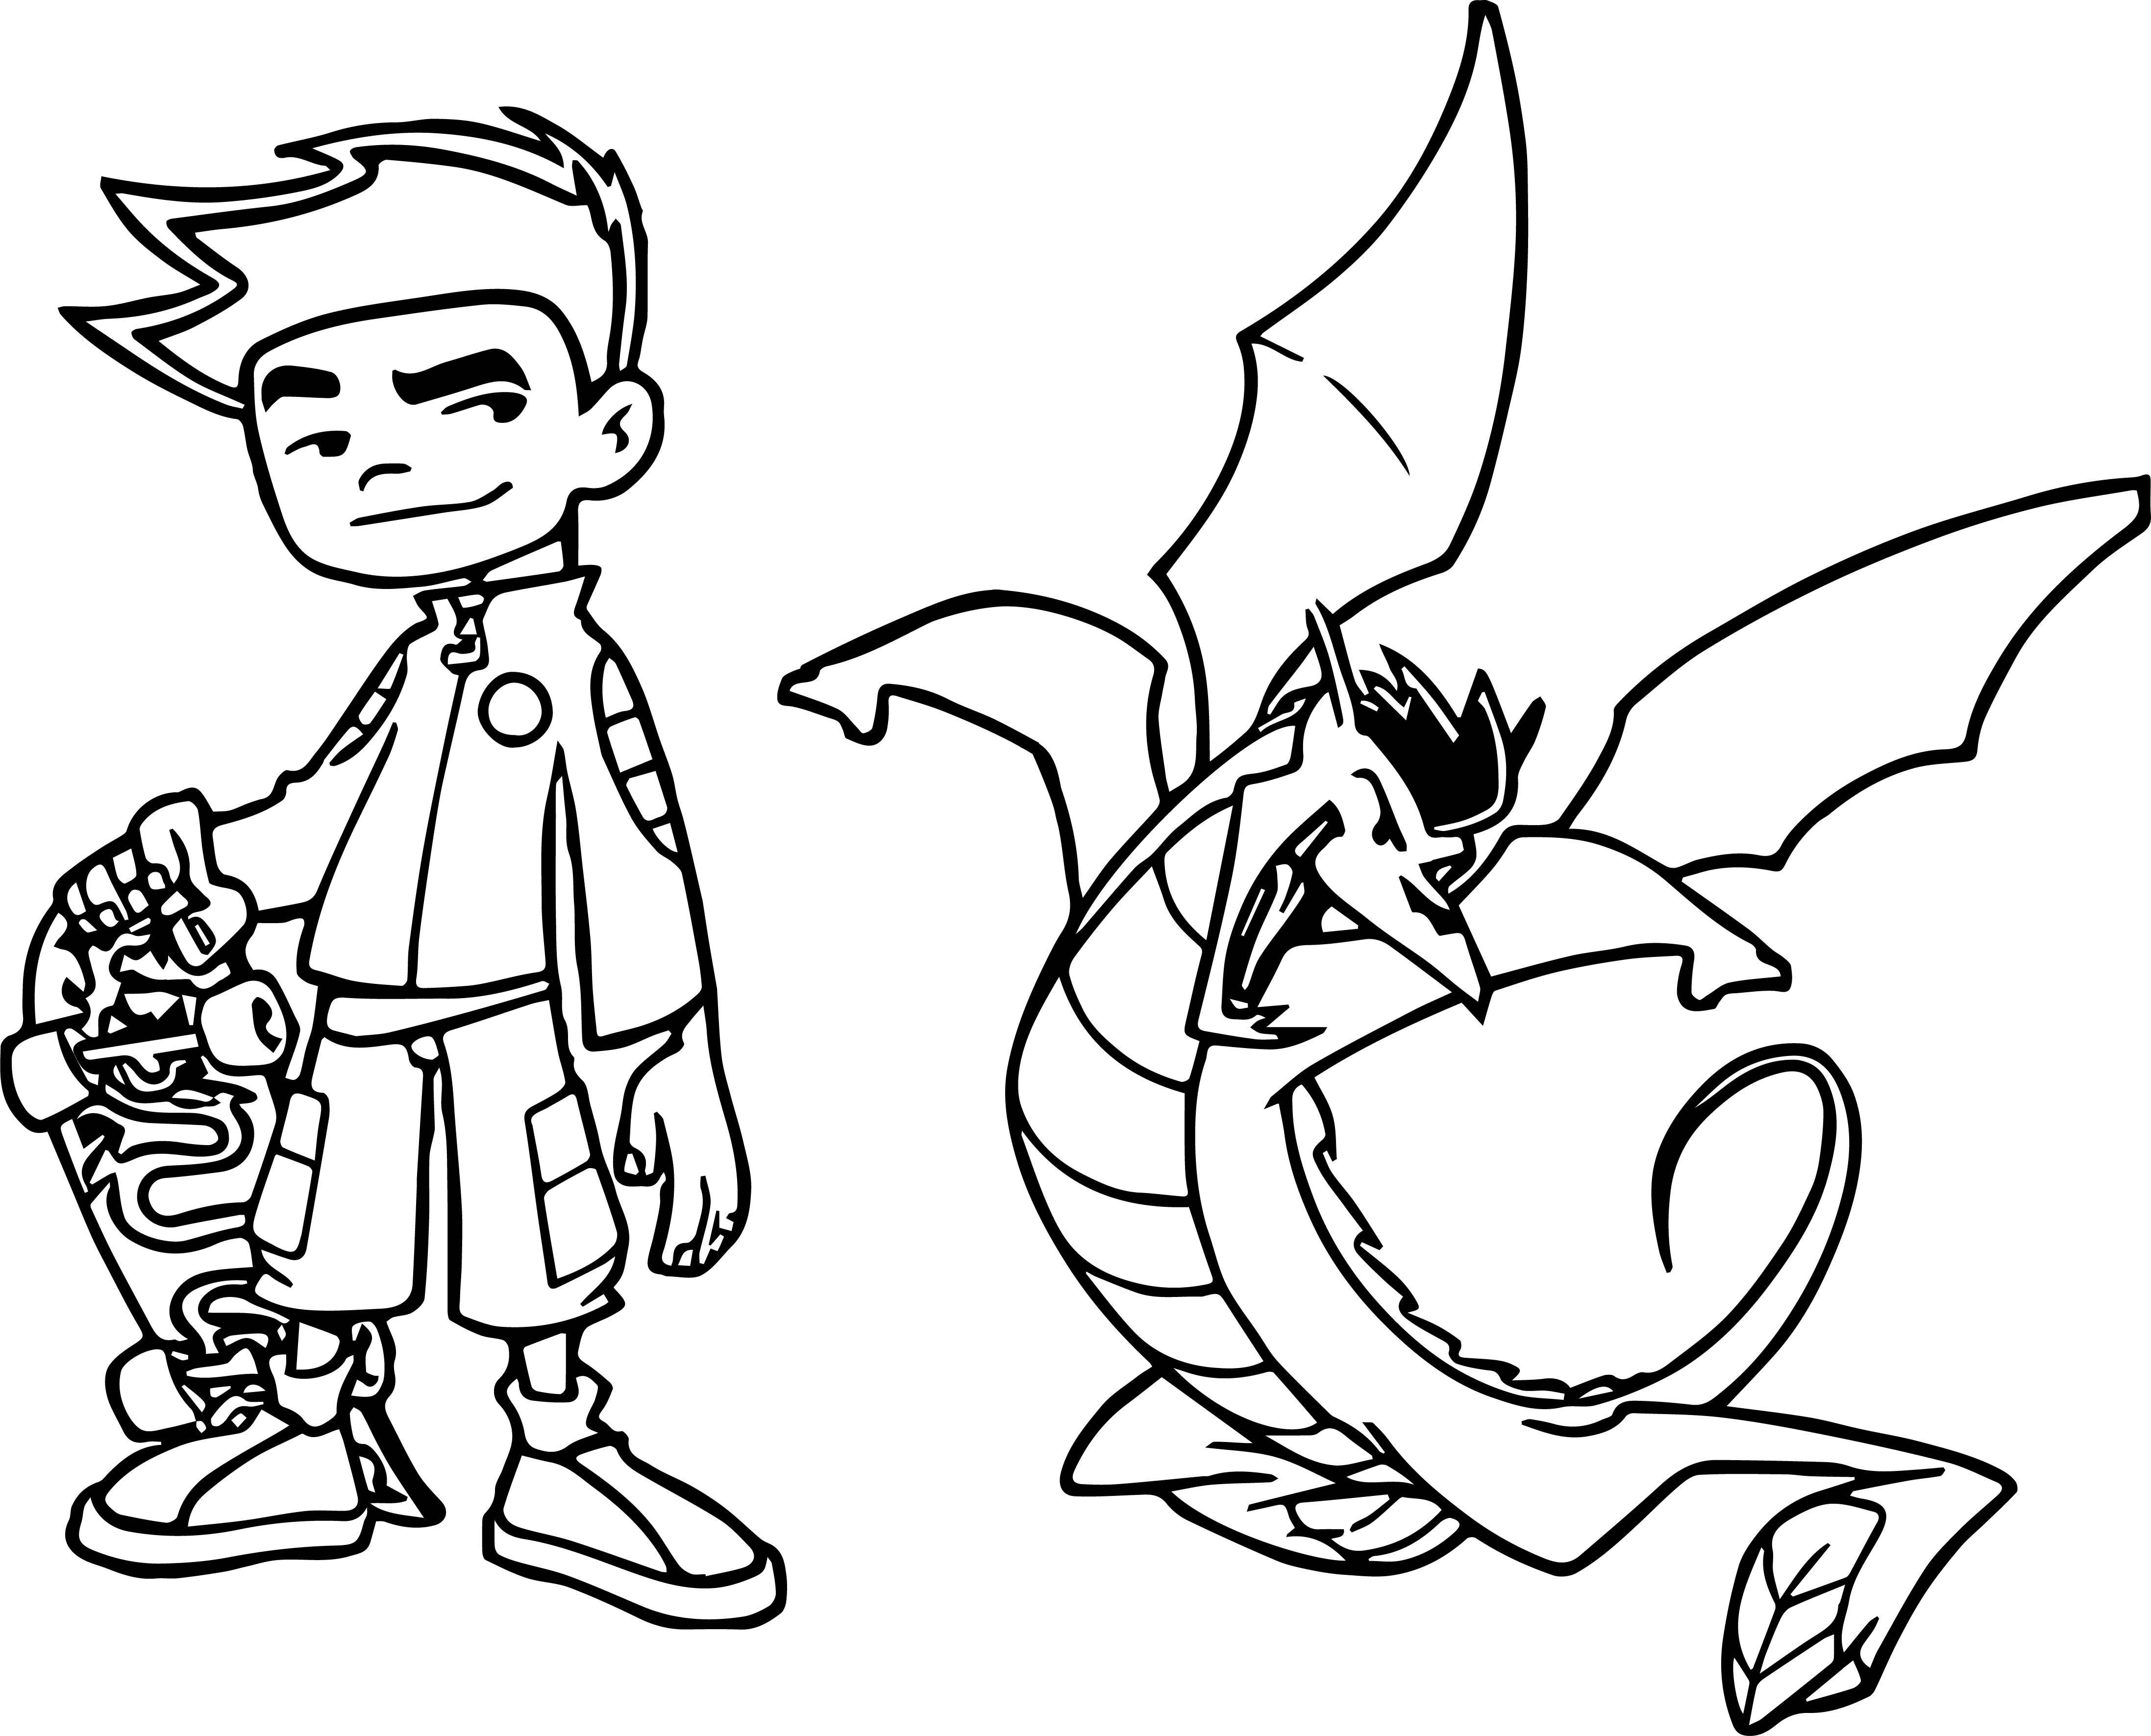 Nice American Dragon Jake Long Kick Coloring Page American Dragon Jake Long Coloring Pages